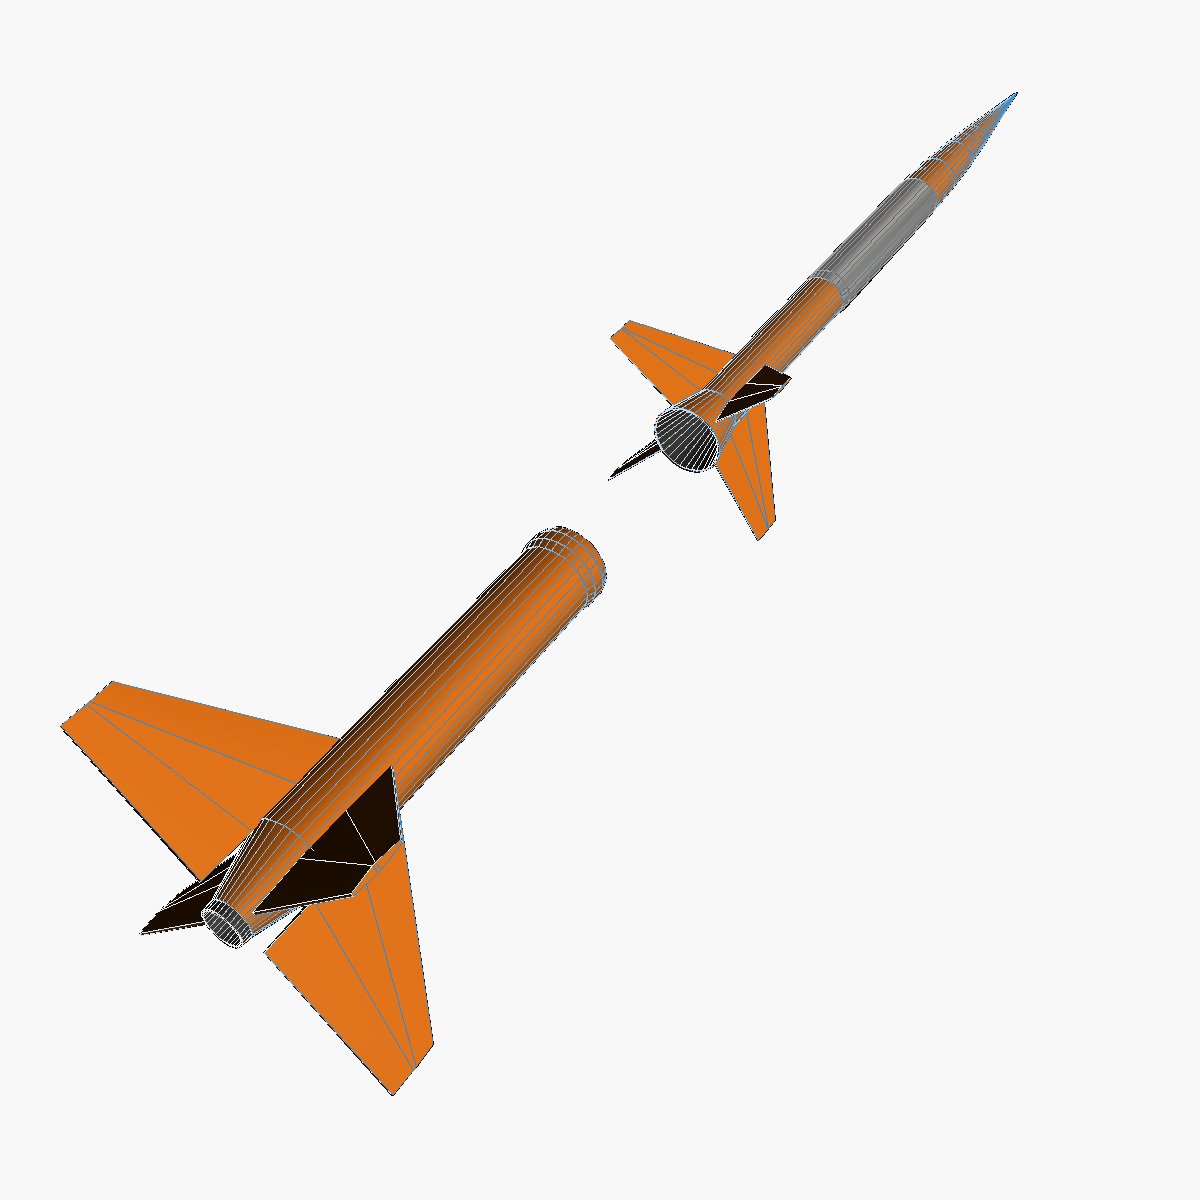 gamma centauro rocket 3d model 3ds dxf fbx blend cob dae x obj 218206